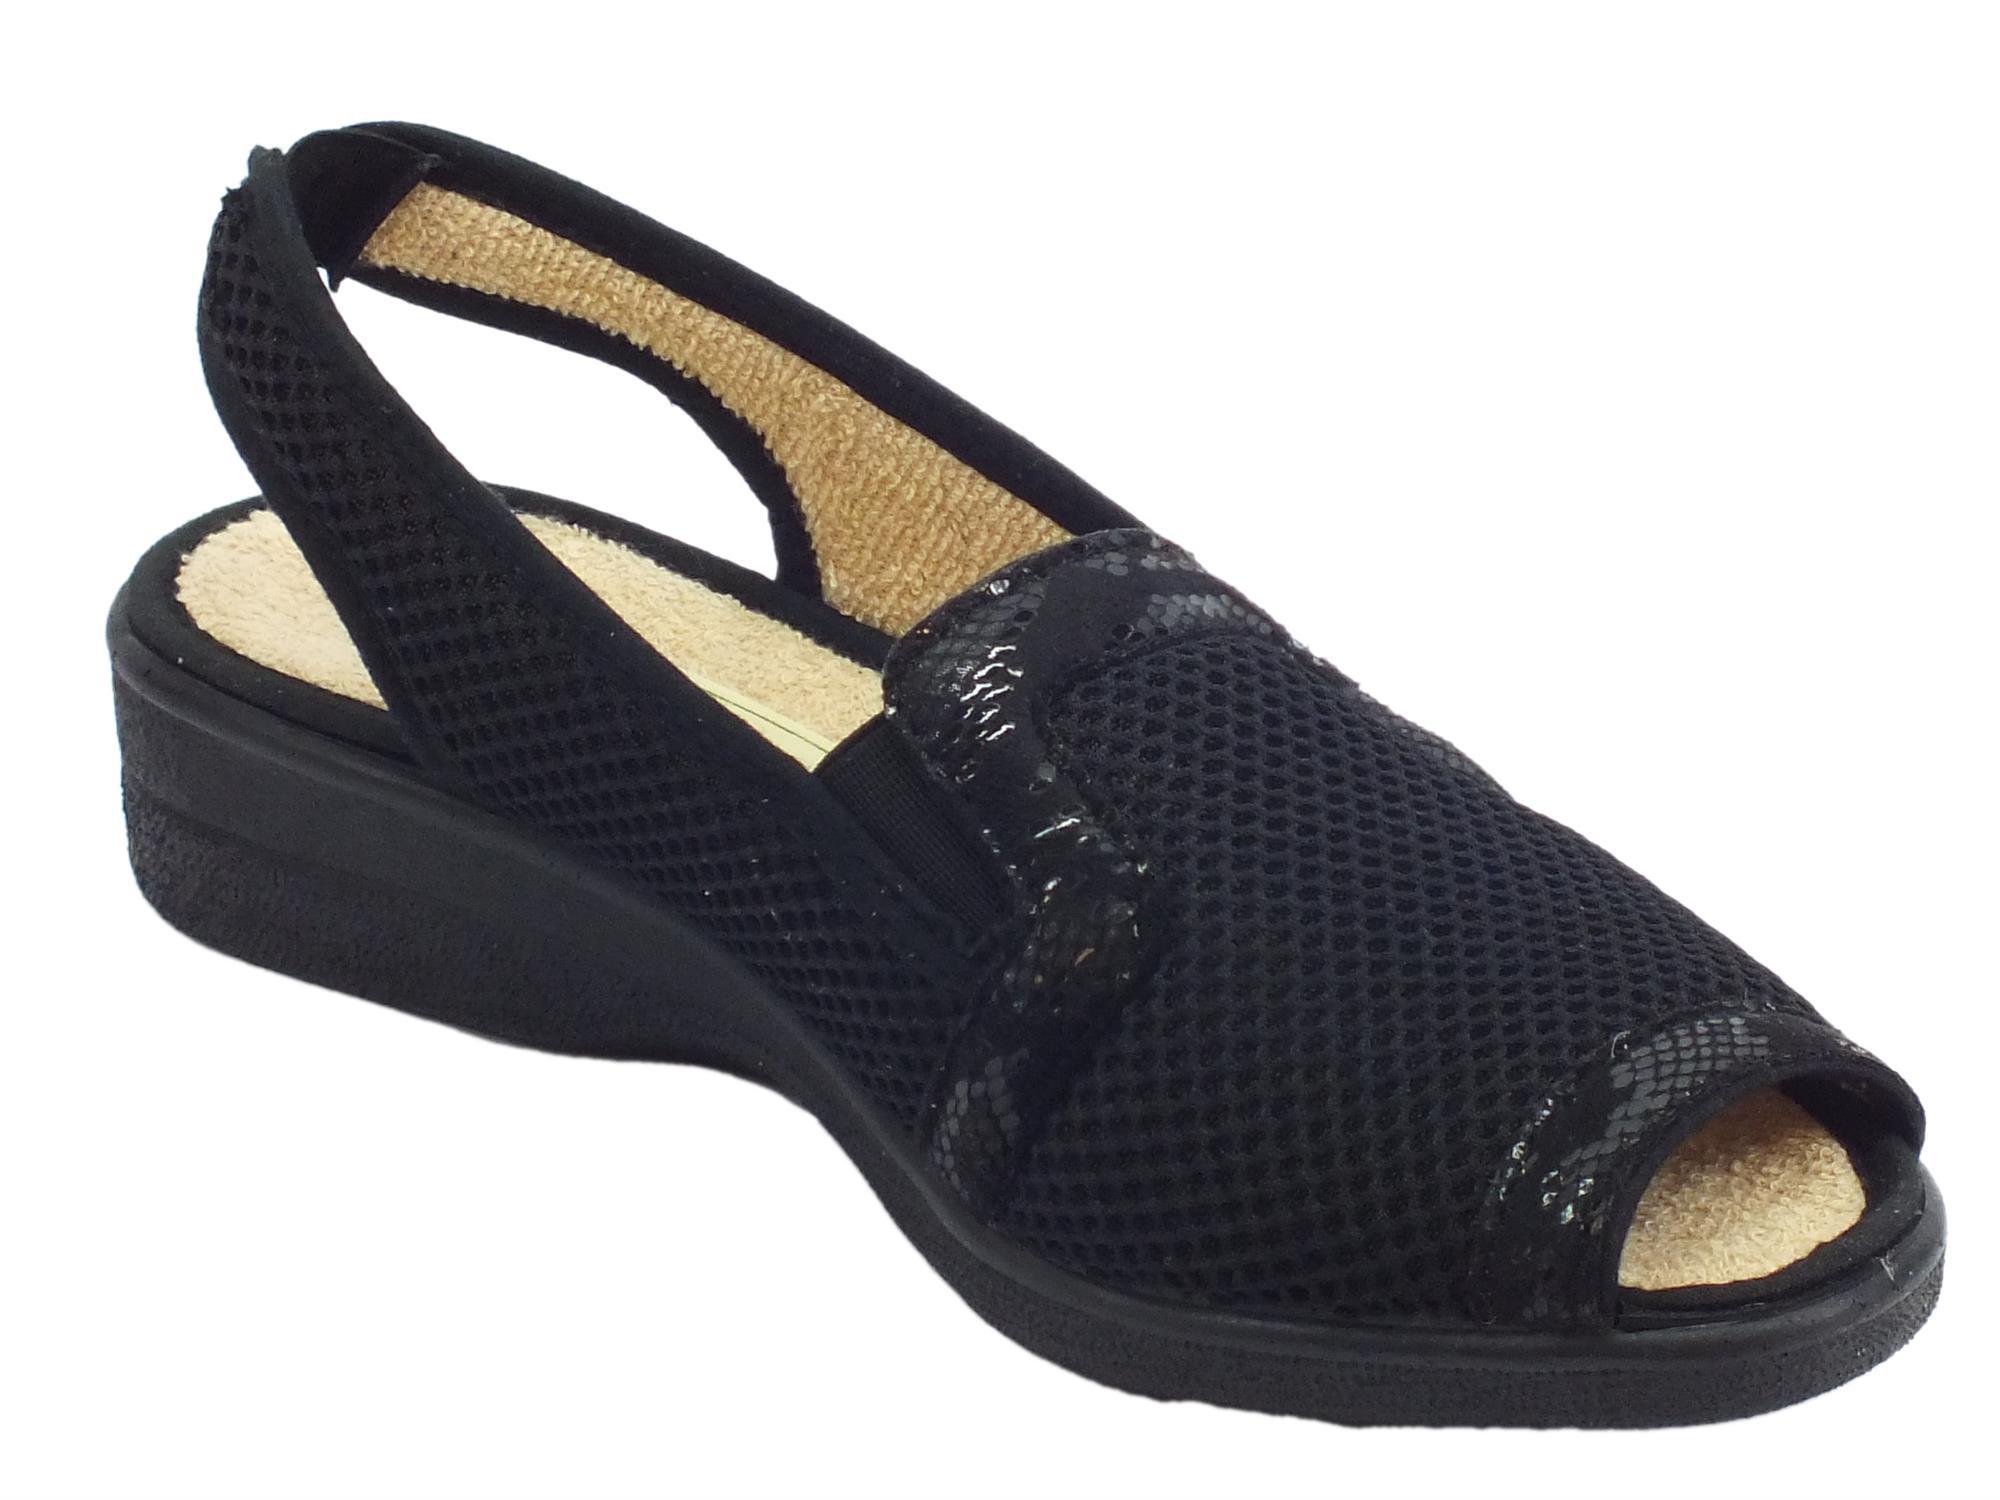 Sandali Susimoda donna tessuto nero zeppa bassa - Vitiello Calzature 12febd81976